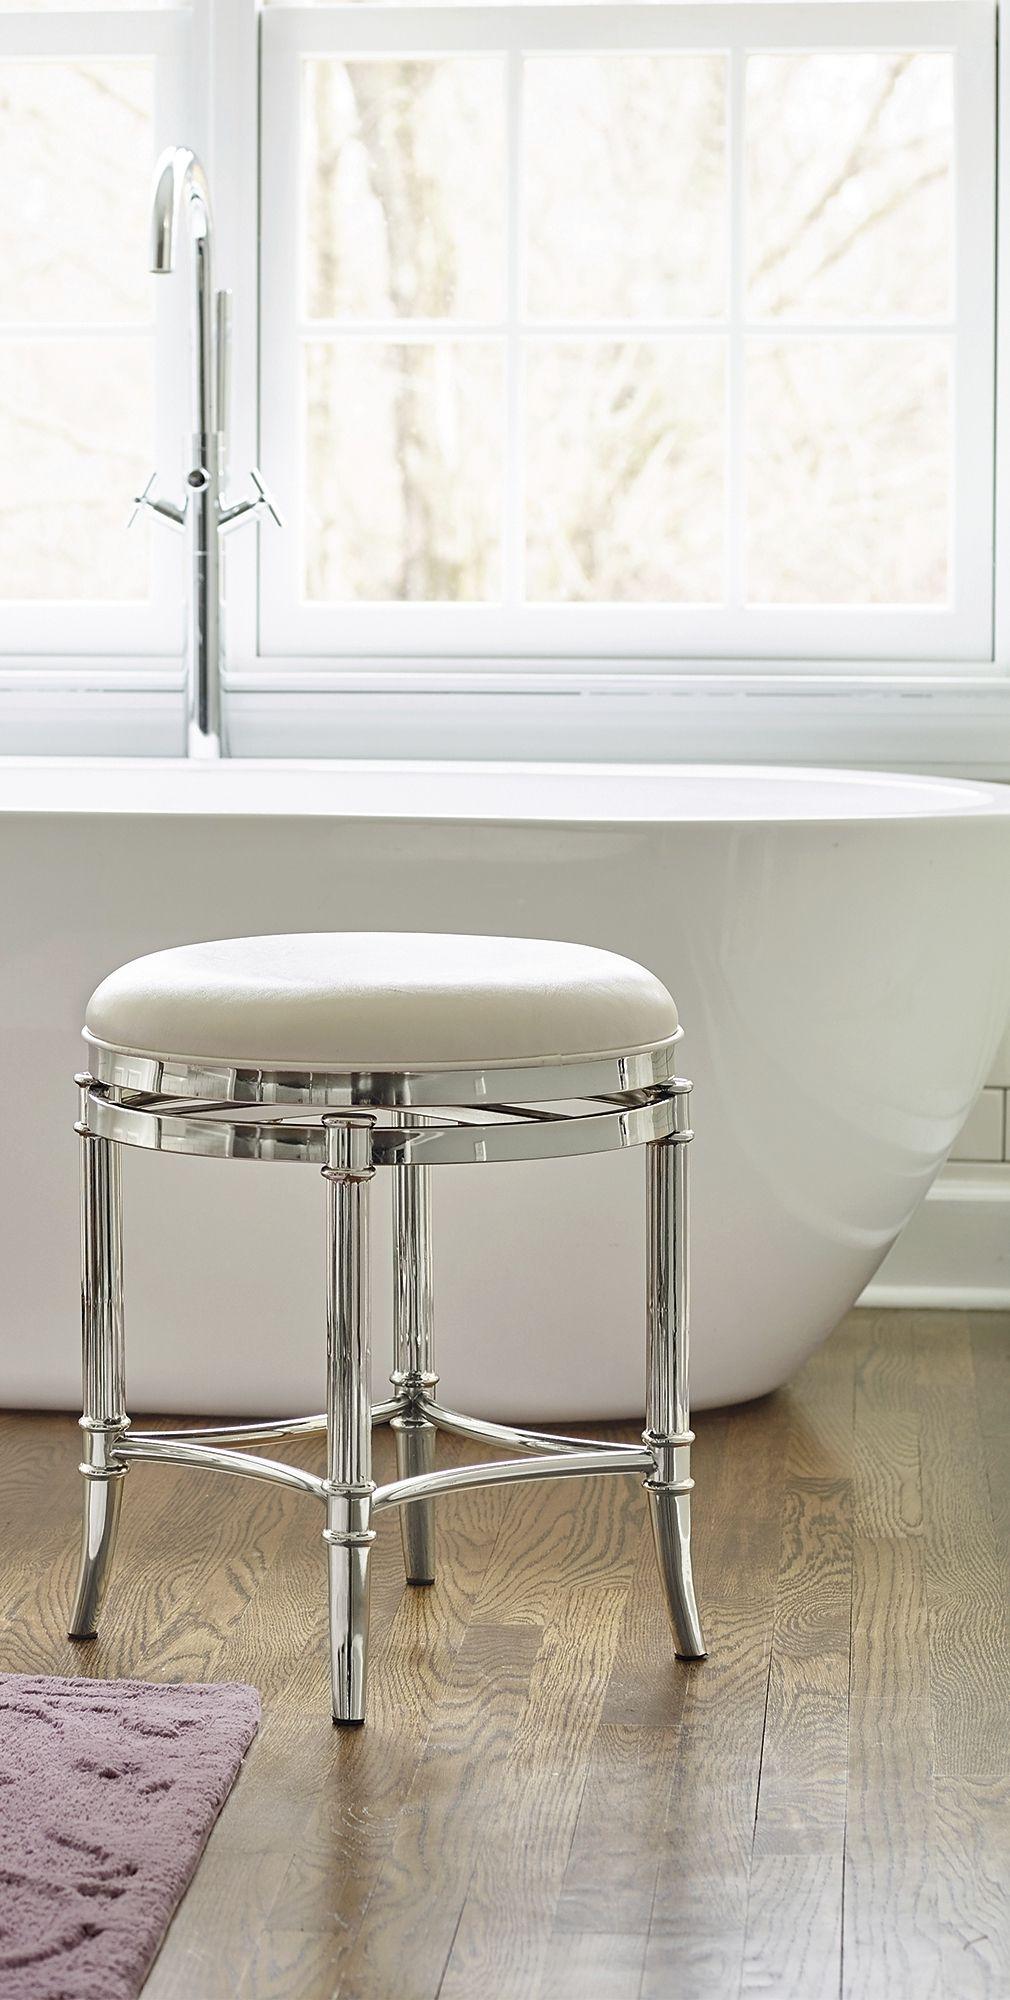 Bailey Swivel Vanity Stool Vanity Stool Vanity Bathroom Shower